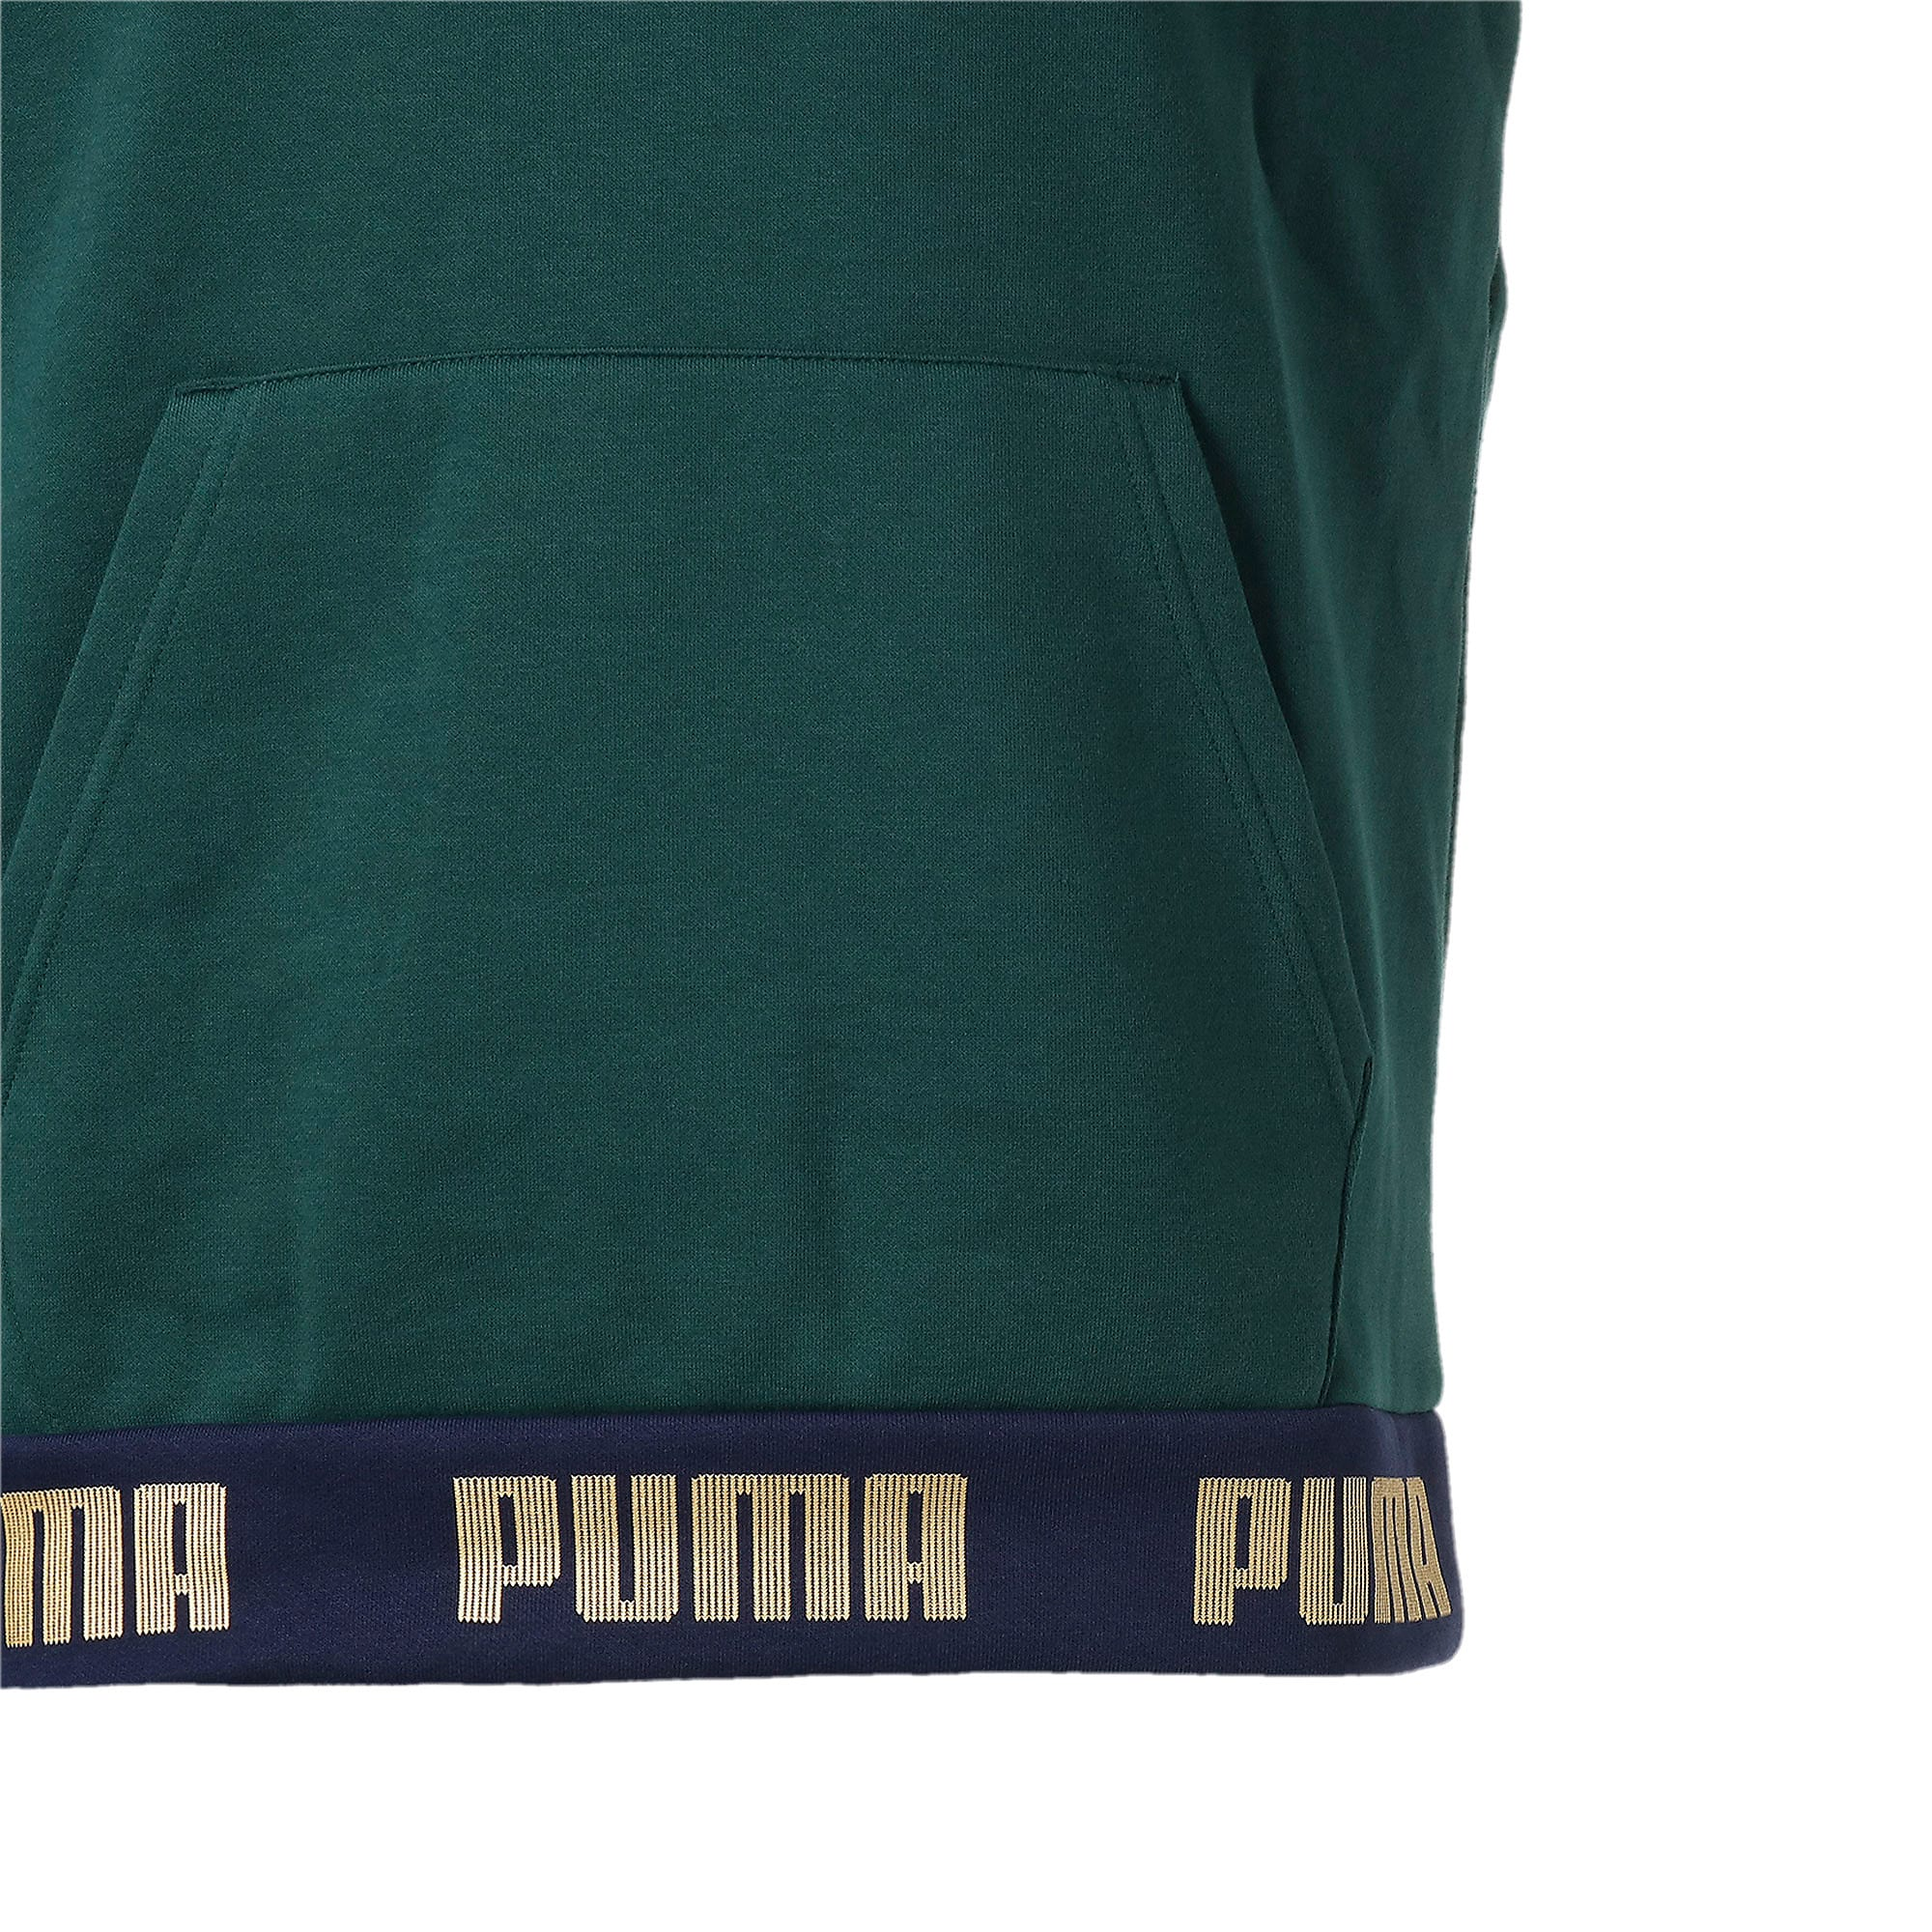 Thumbnail 6 of FIGC イタリア FTBL CULTURE フーディー, Ponderosa Pine-Team Gold, medium-JPN